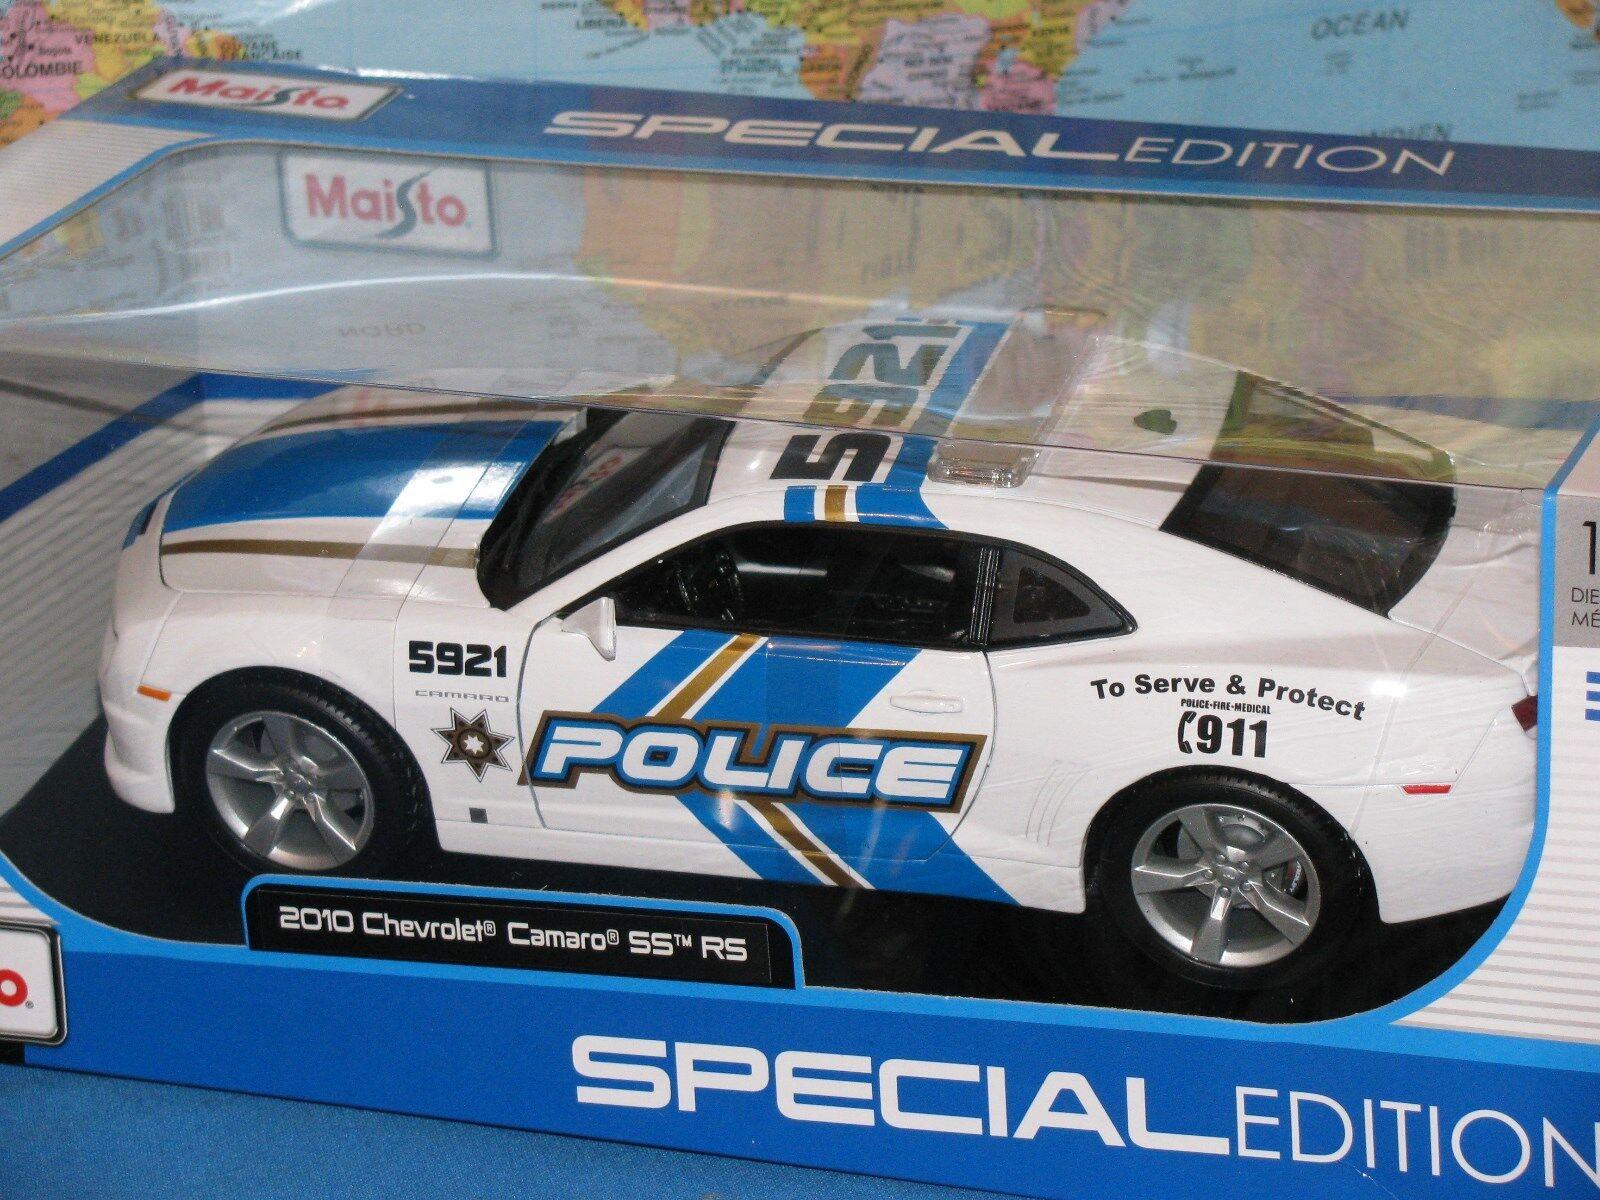 1 18 2010 CHEVROLET CAMARO SS SS SS POLICE MAISTO SPECIAL EDITION DIECAST BRAND NEW 2a70f1